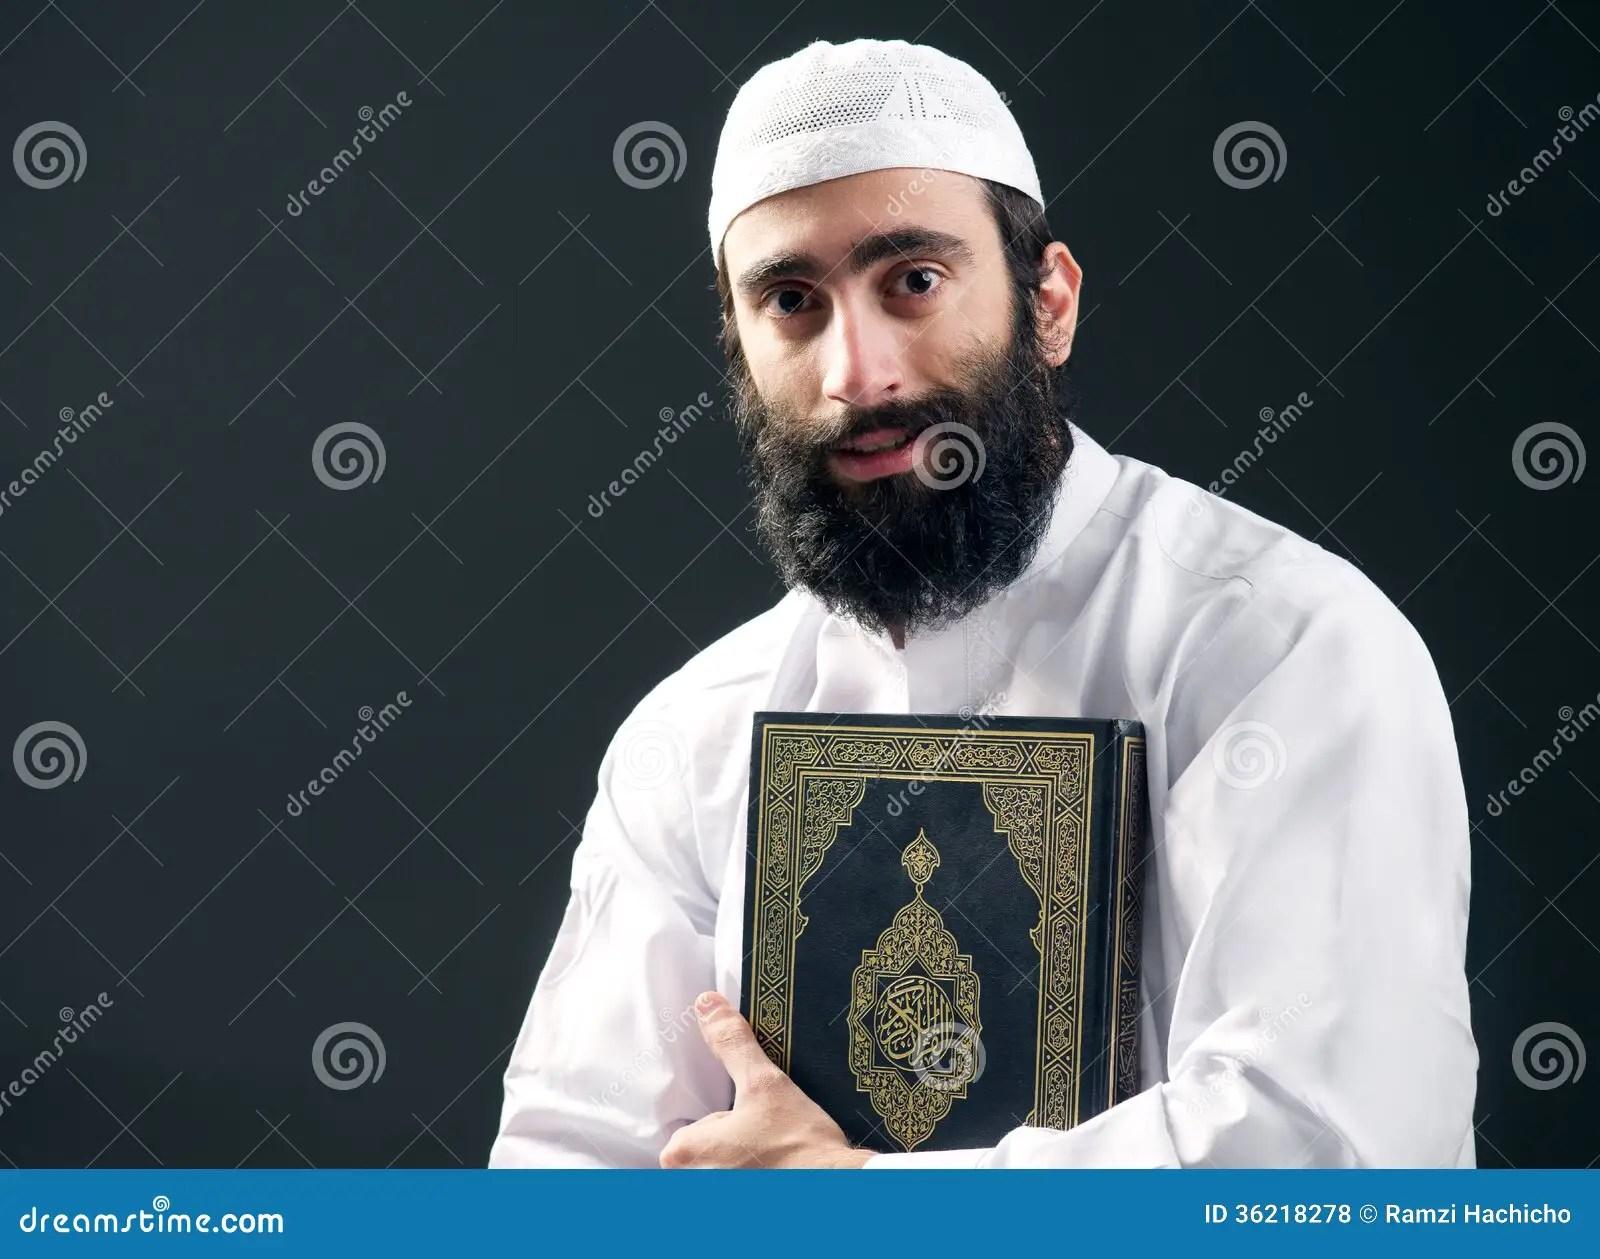 Arabian Muslim Man With Beard Holding The Holy Book Quran